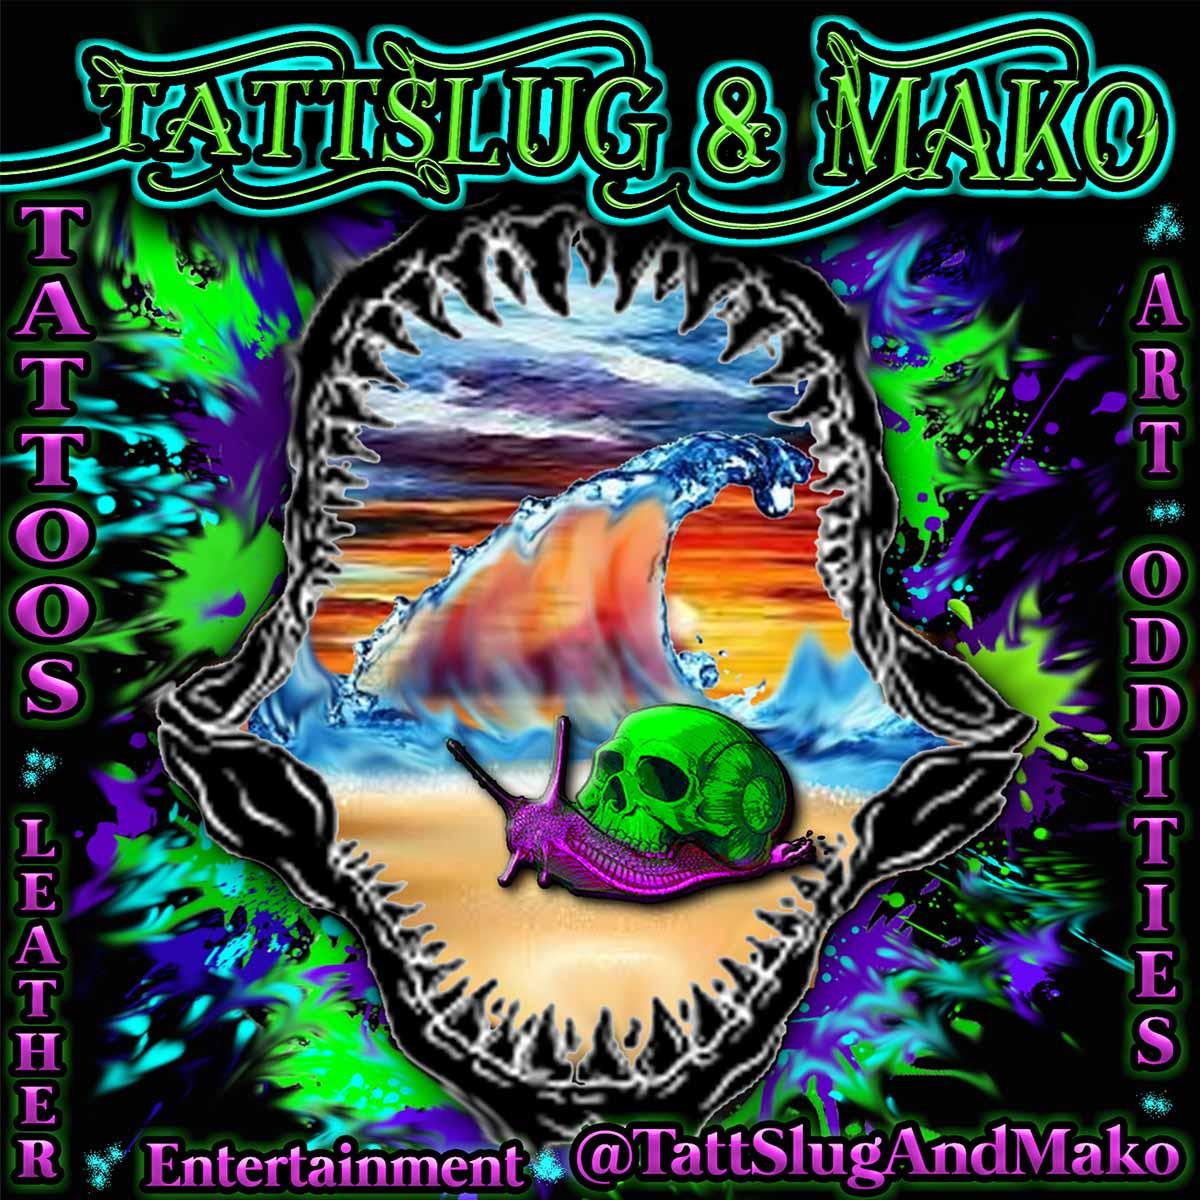 TattSlug&Mako primary image